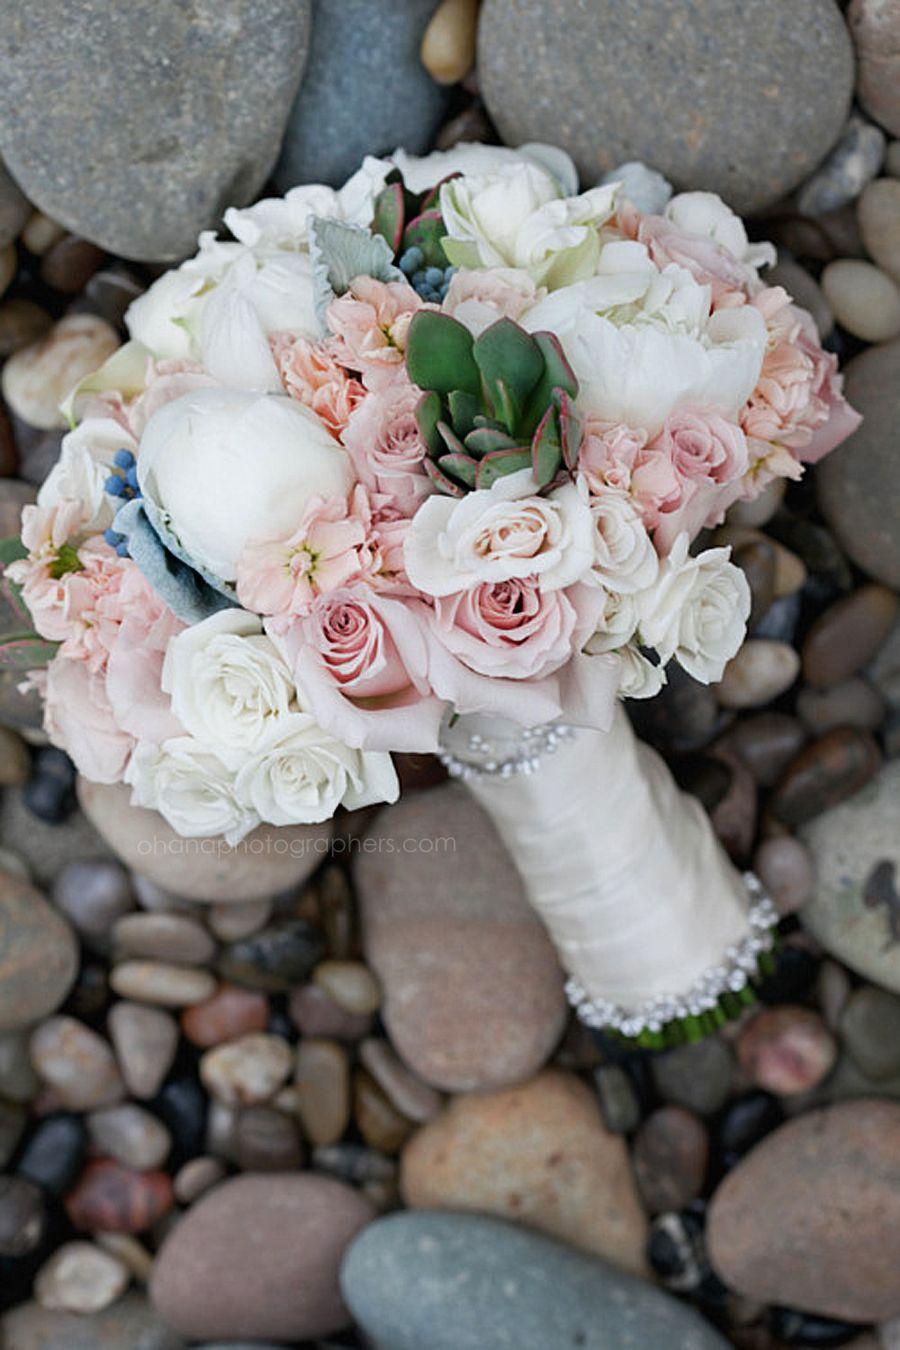 Scripps Seaside Forum Wedding In La Jolla Wedding Bouquet With